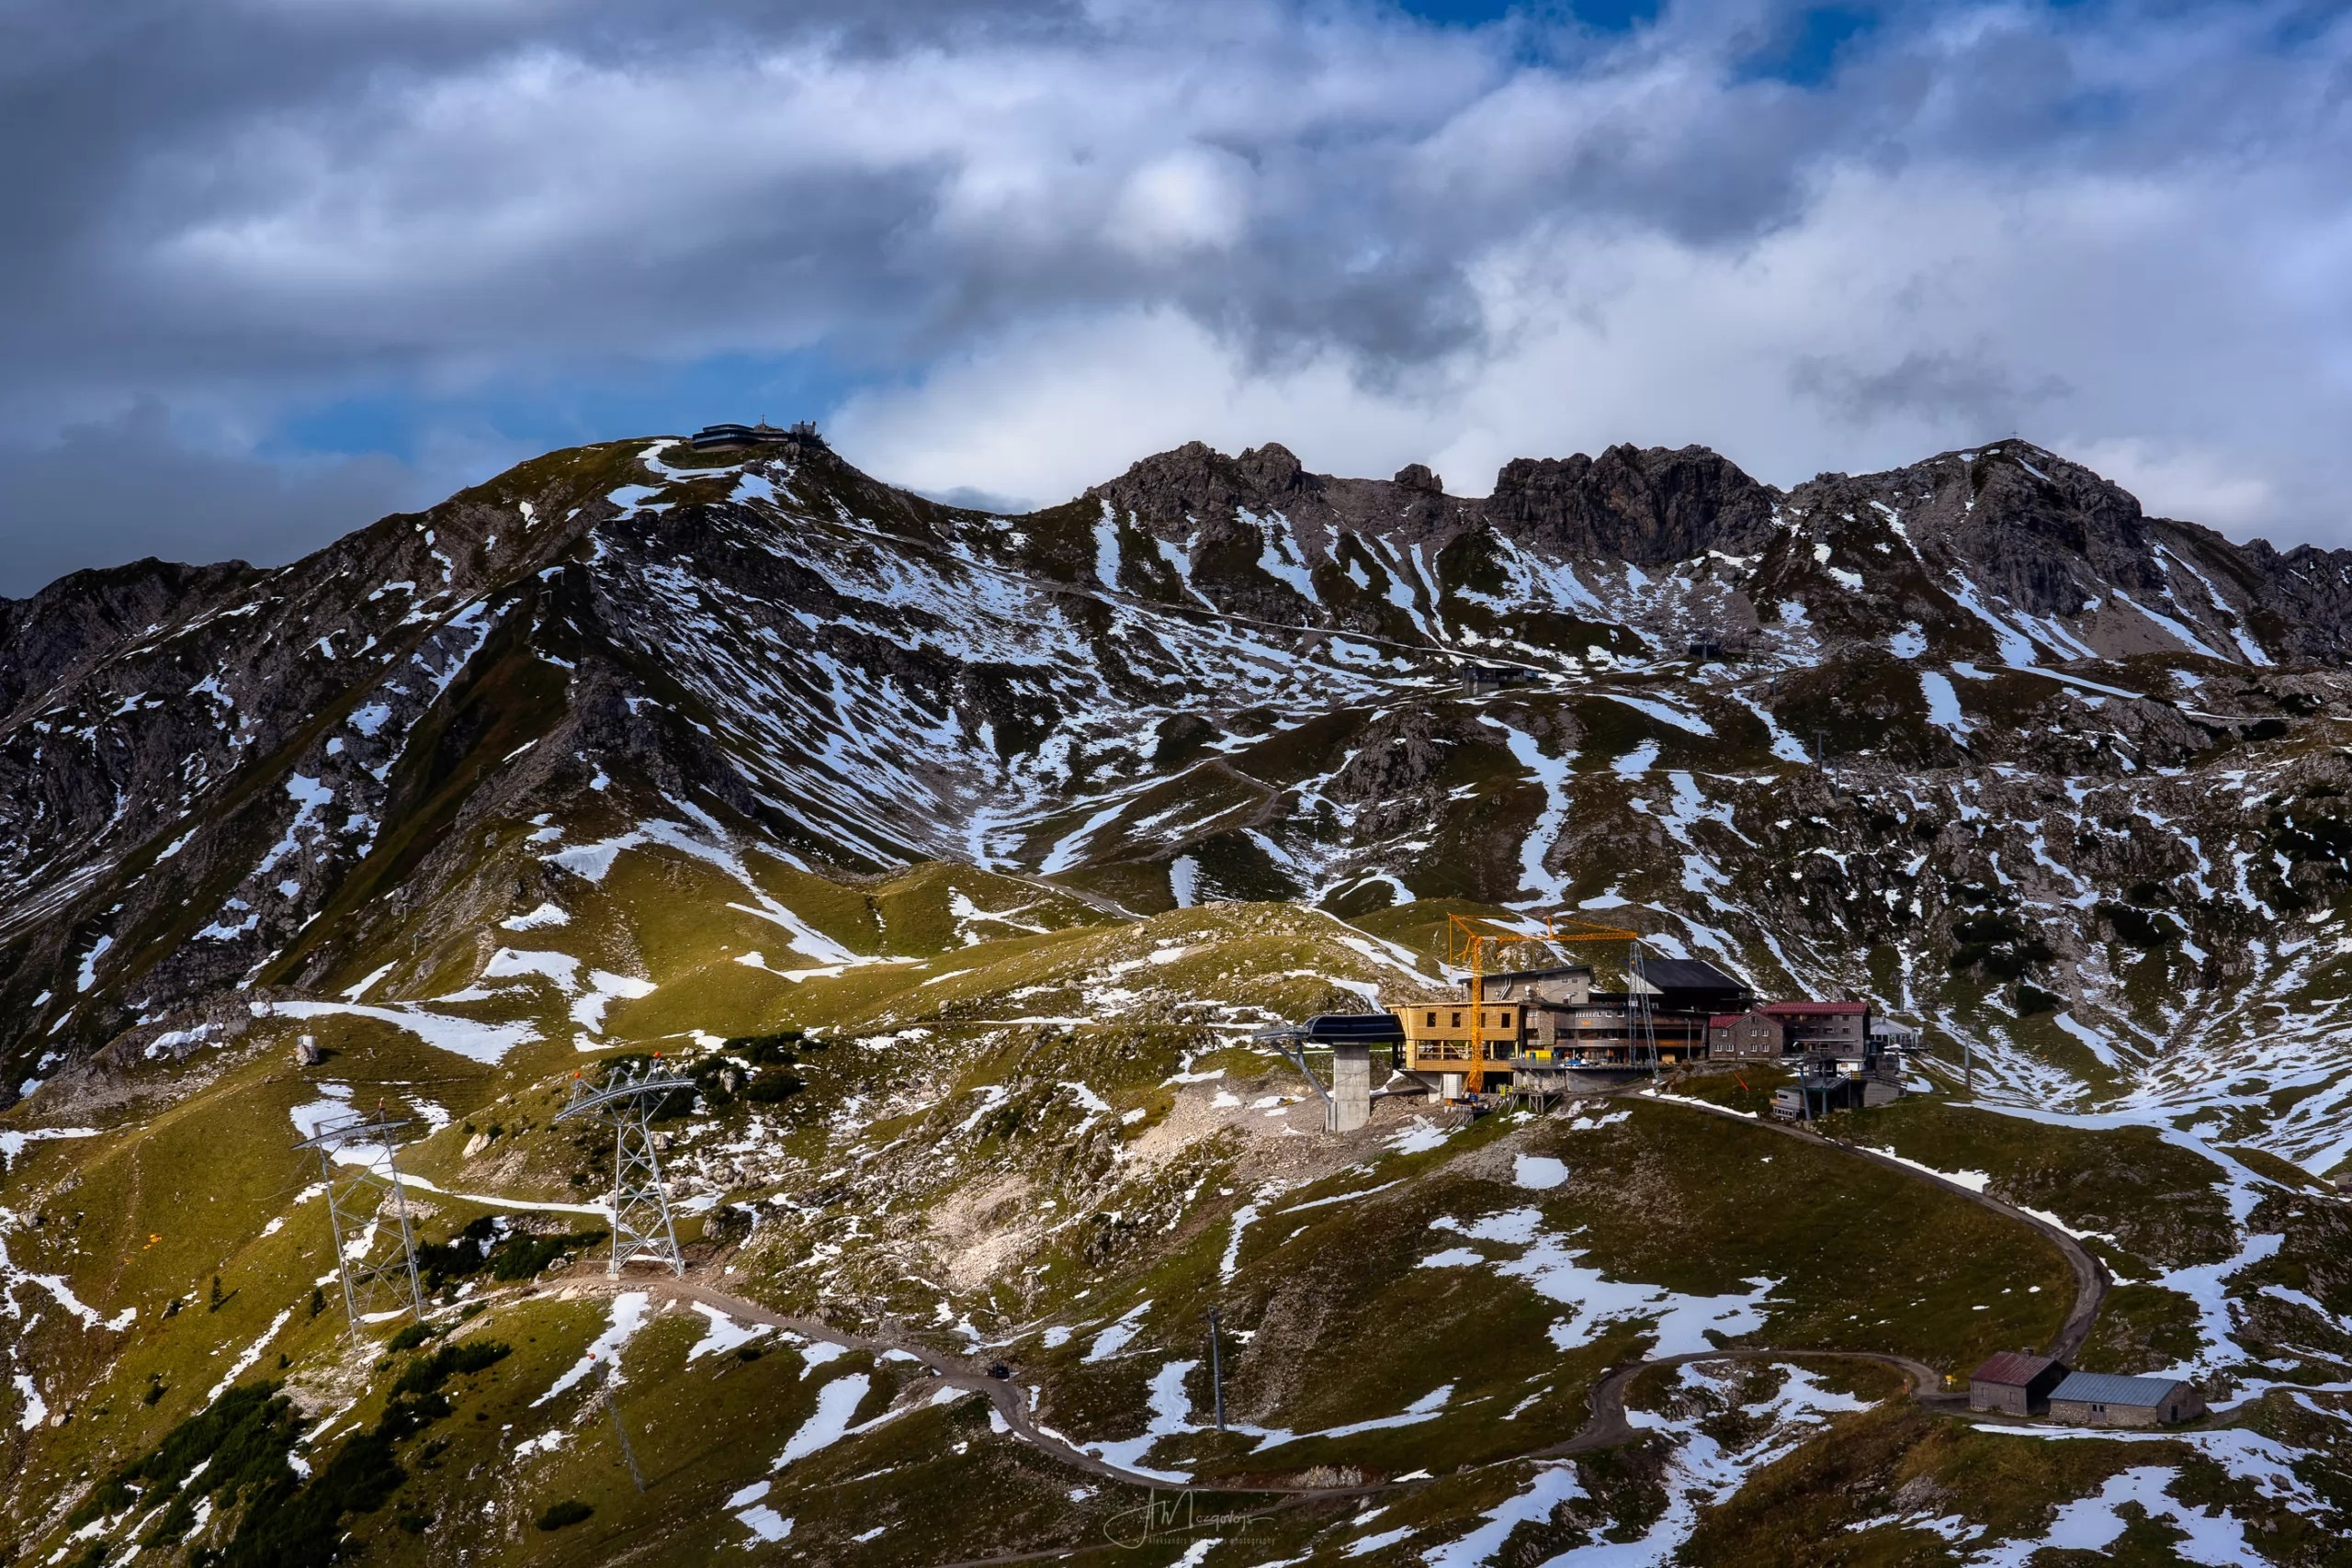 Höfatsblick mountain station